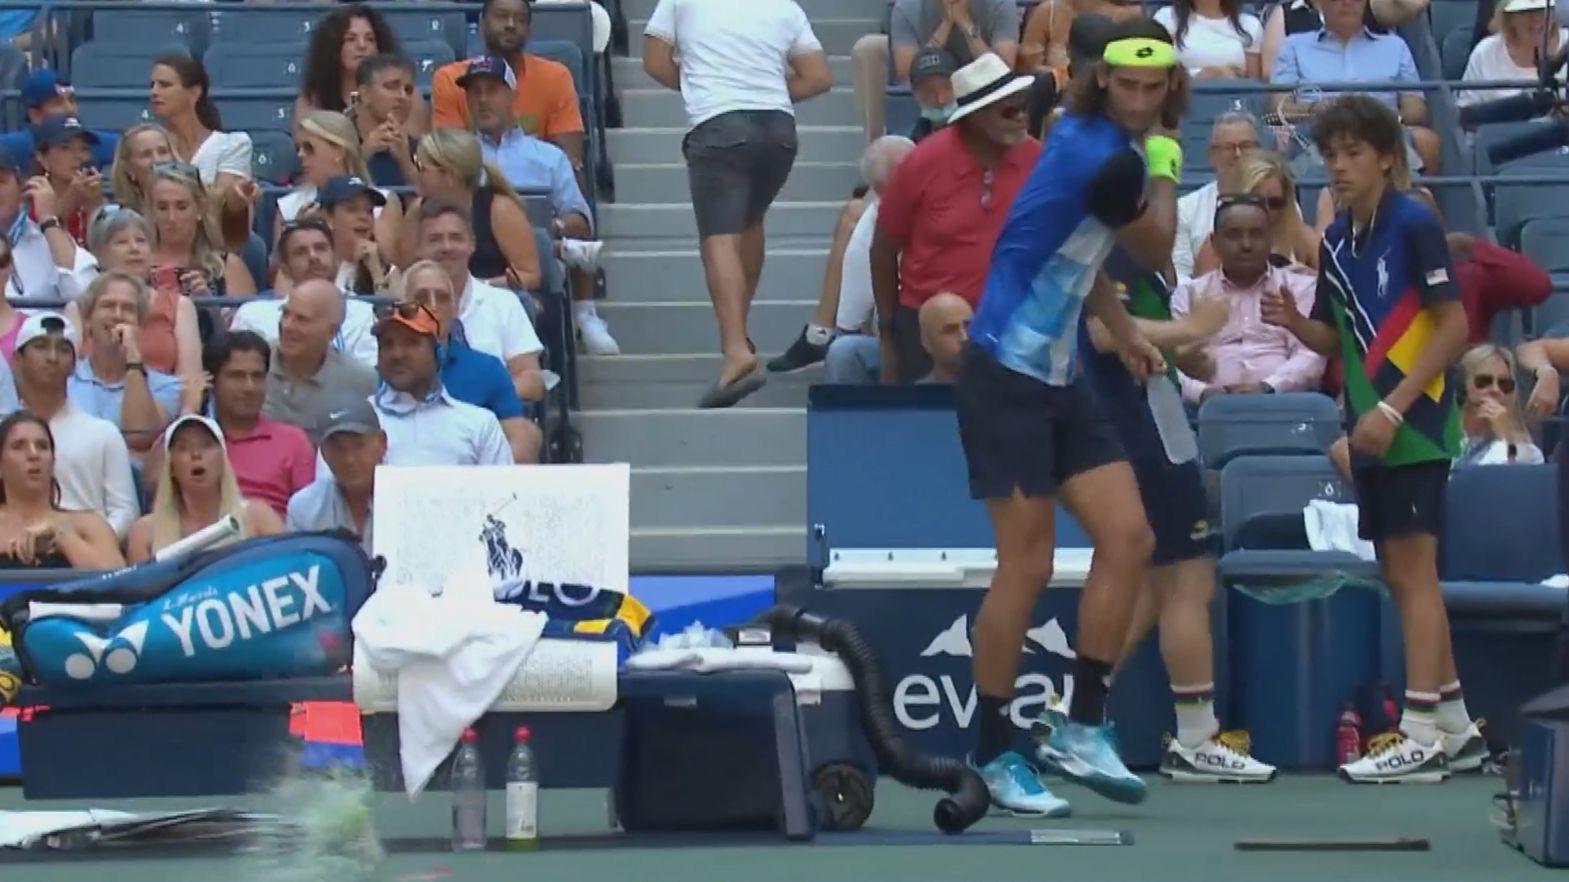 Lloyd Harris tantrum leads to 'absurd' moment in Zverev's US Open quarter-final win